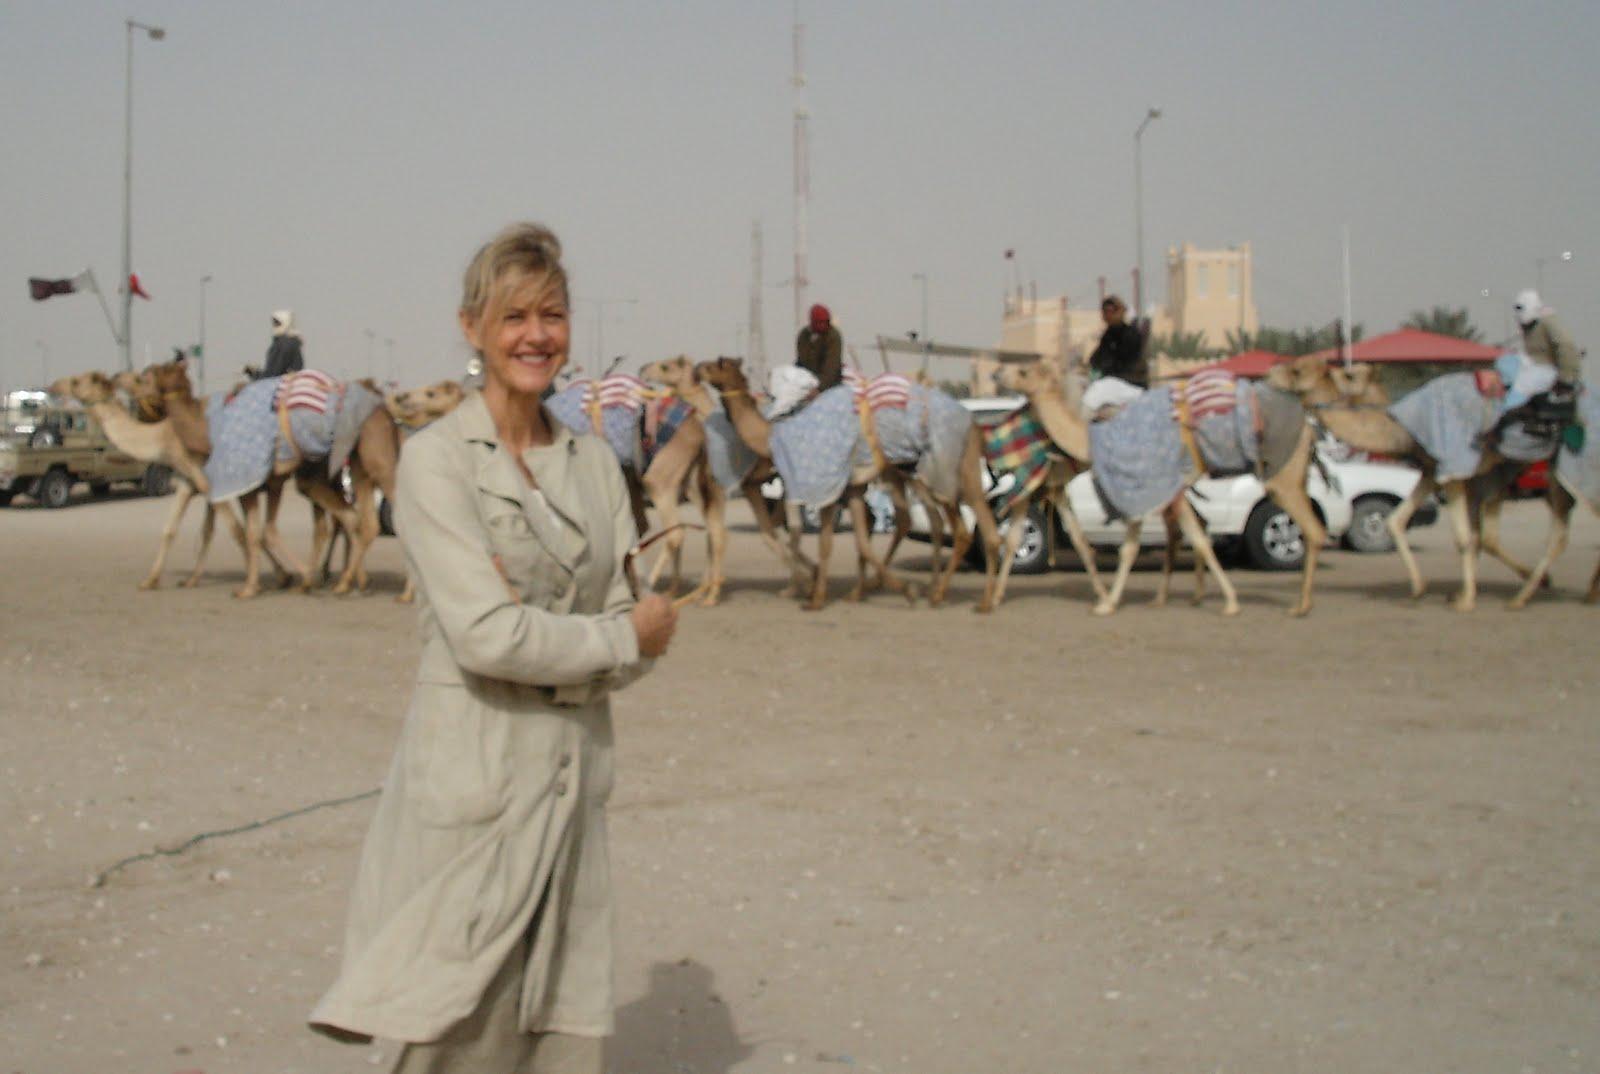 http://2.bp.blogspot.com/-mcrWhfpggkc/TZwPQItQh3I/AAAAAAAABXs/gSsNuuEITvI/s1600/camel+race+January27+005.1.jpg